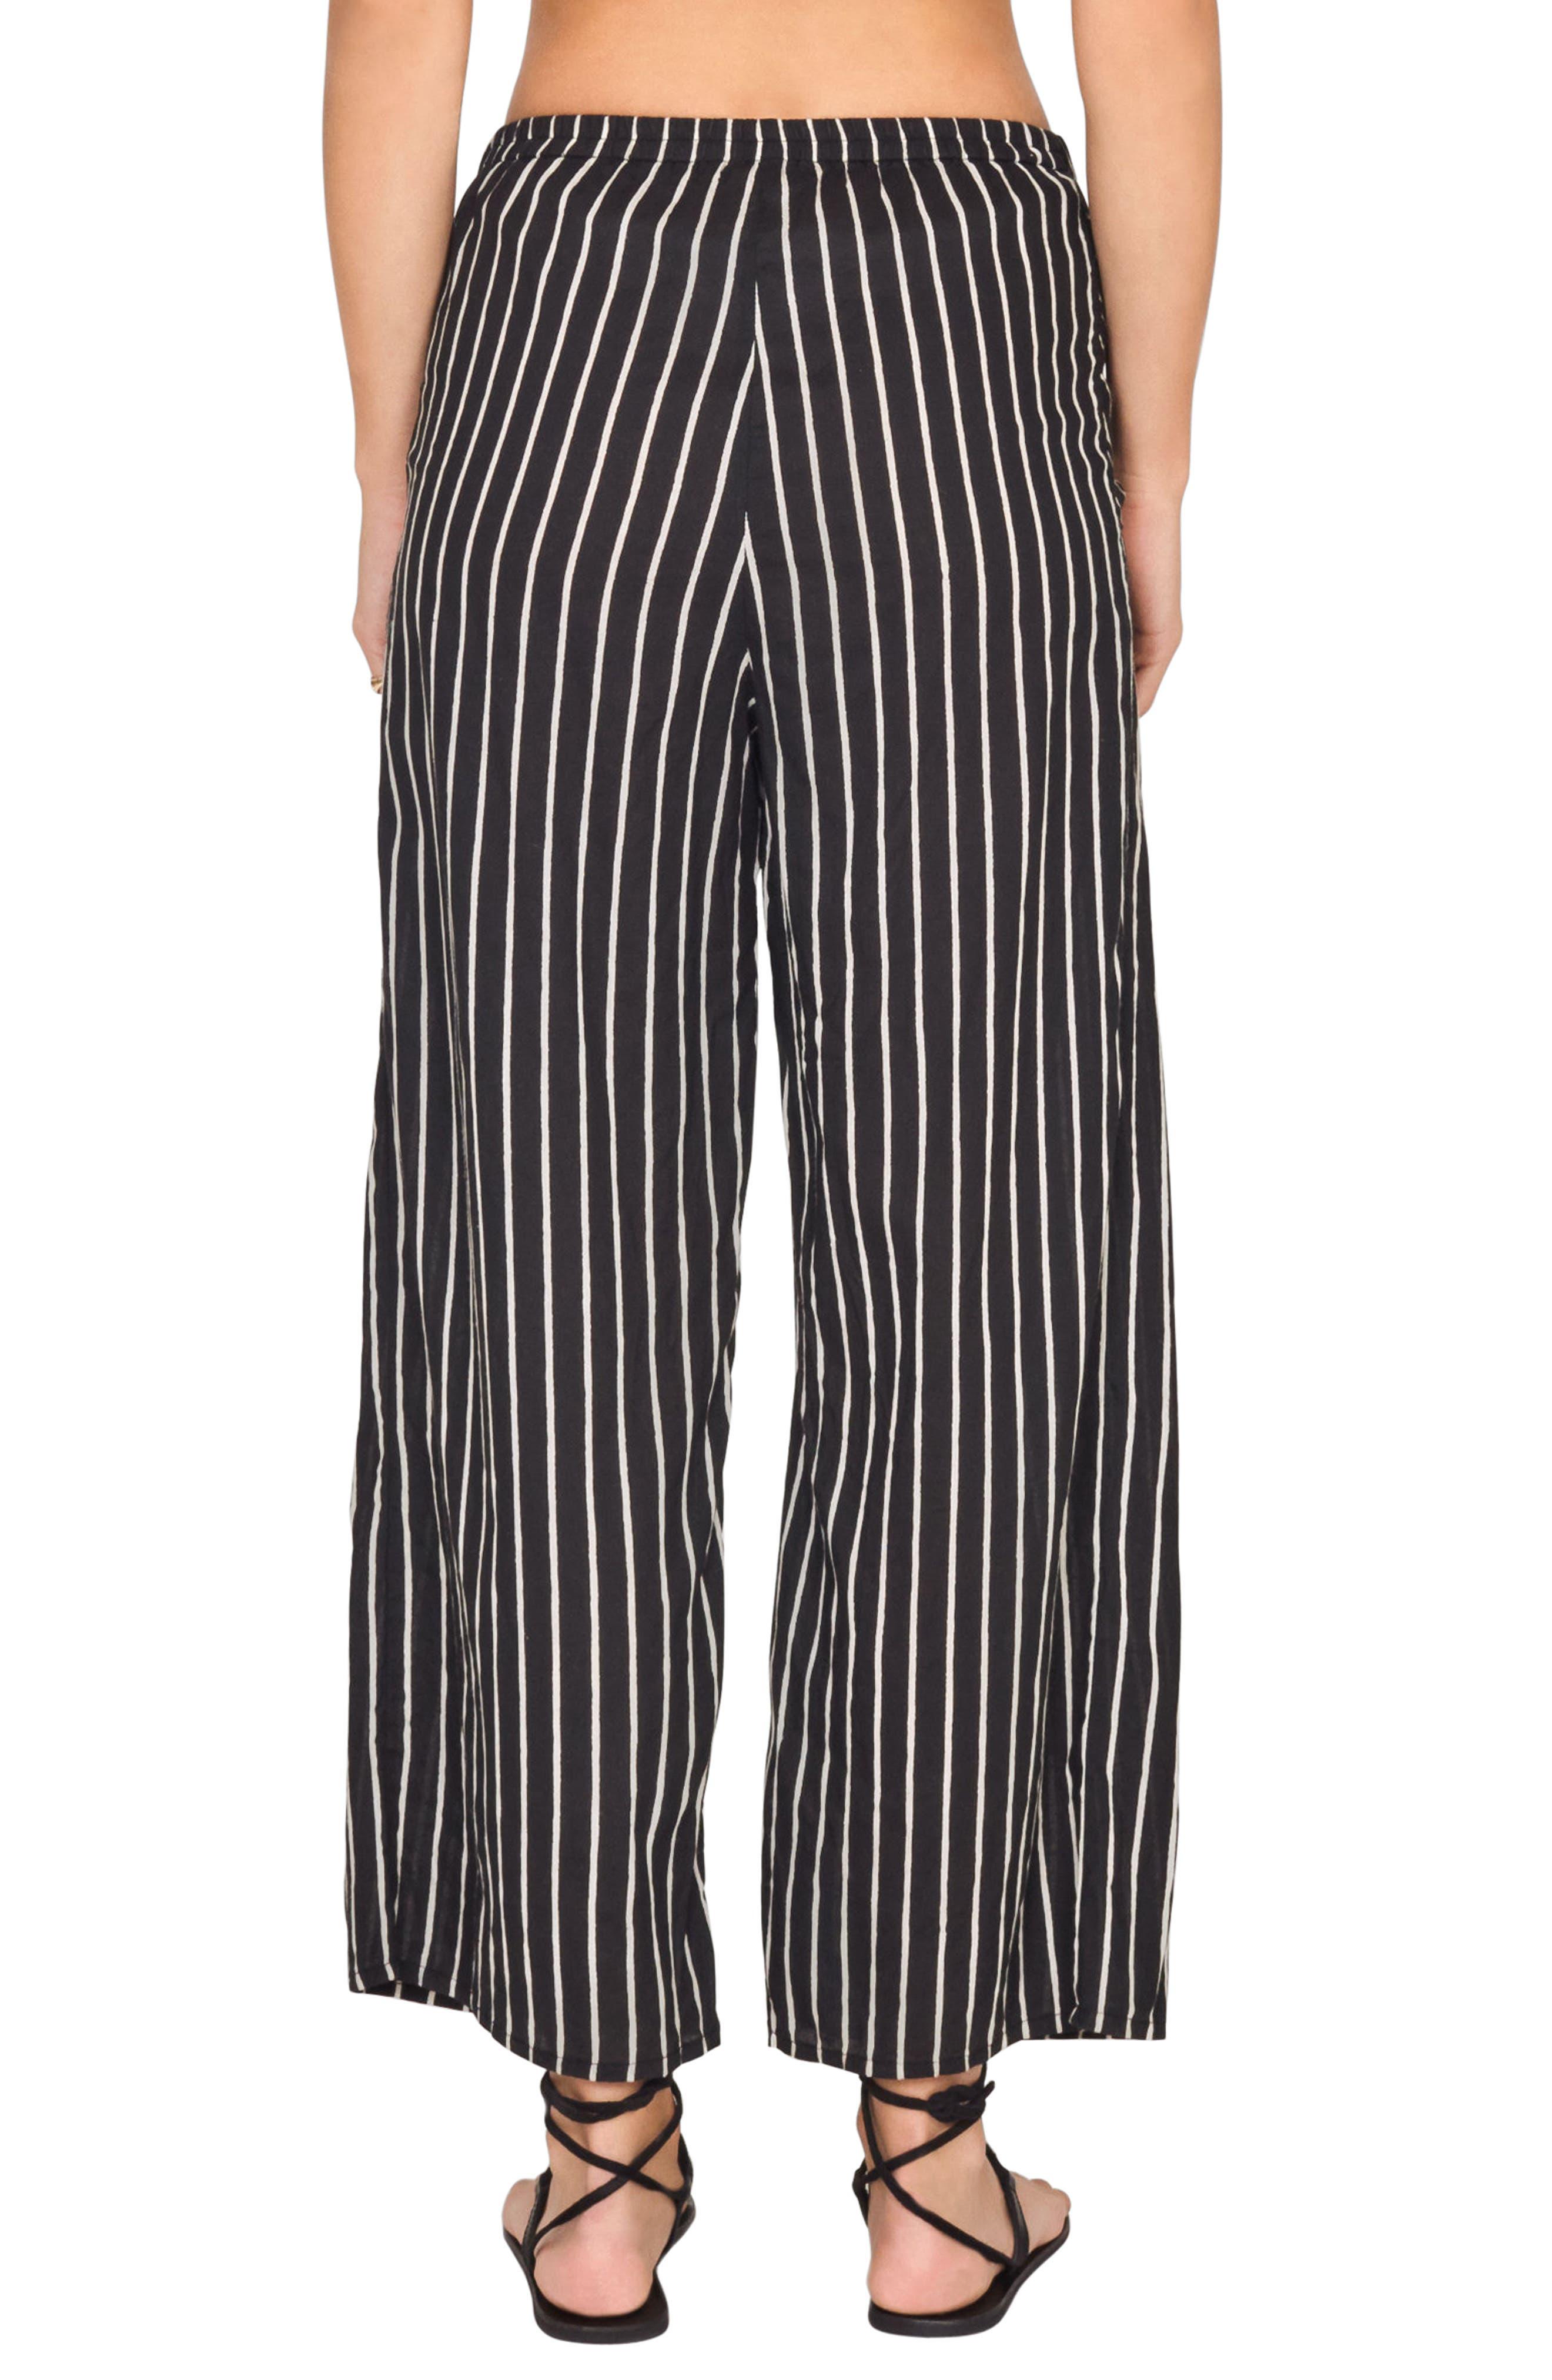 Blurred Lines Knot Front Pants,                             Alternate thumbnail 3, color,                             Black Sands